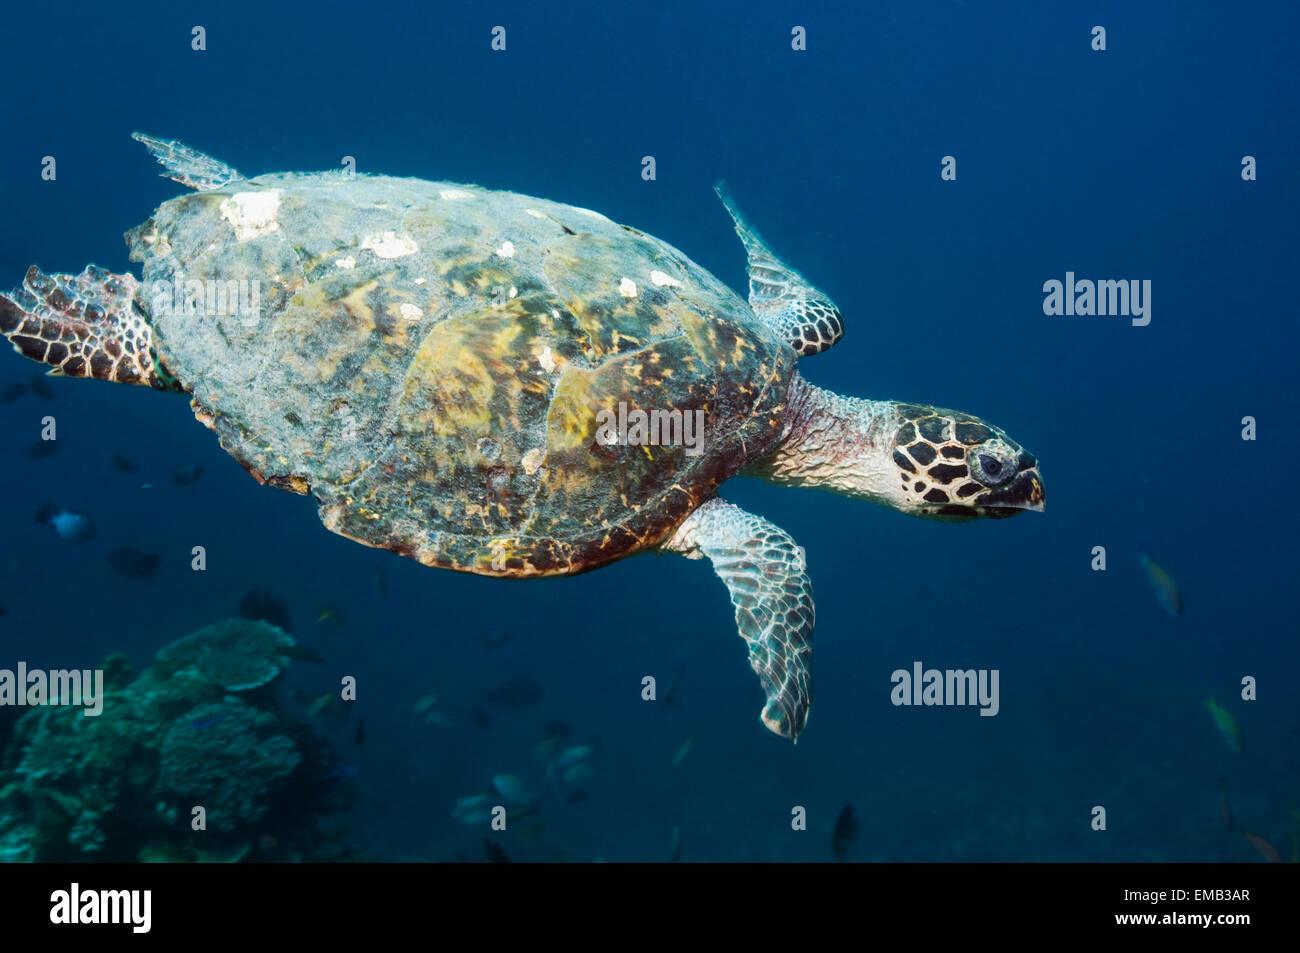 Hawksbill turtle (Eretmochelys imbricata) swimming over coral reef.  Rinca, Komodo National Park, Indonesia. Stock Photo